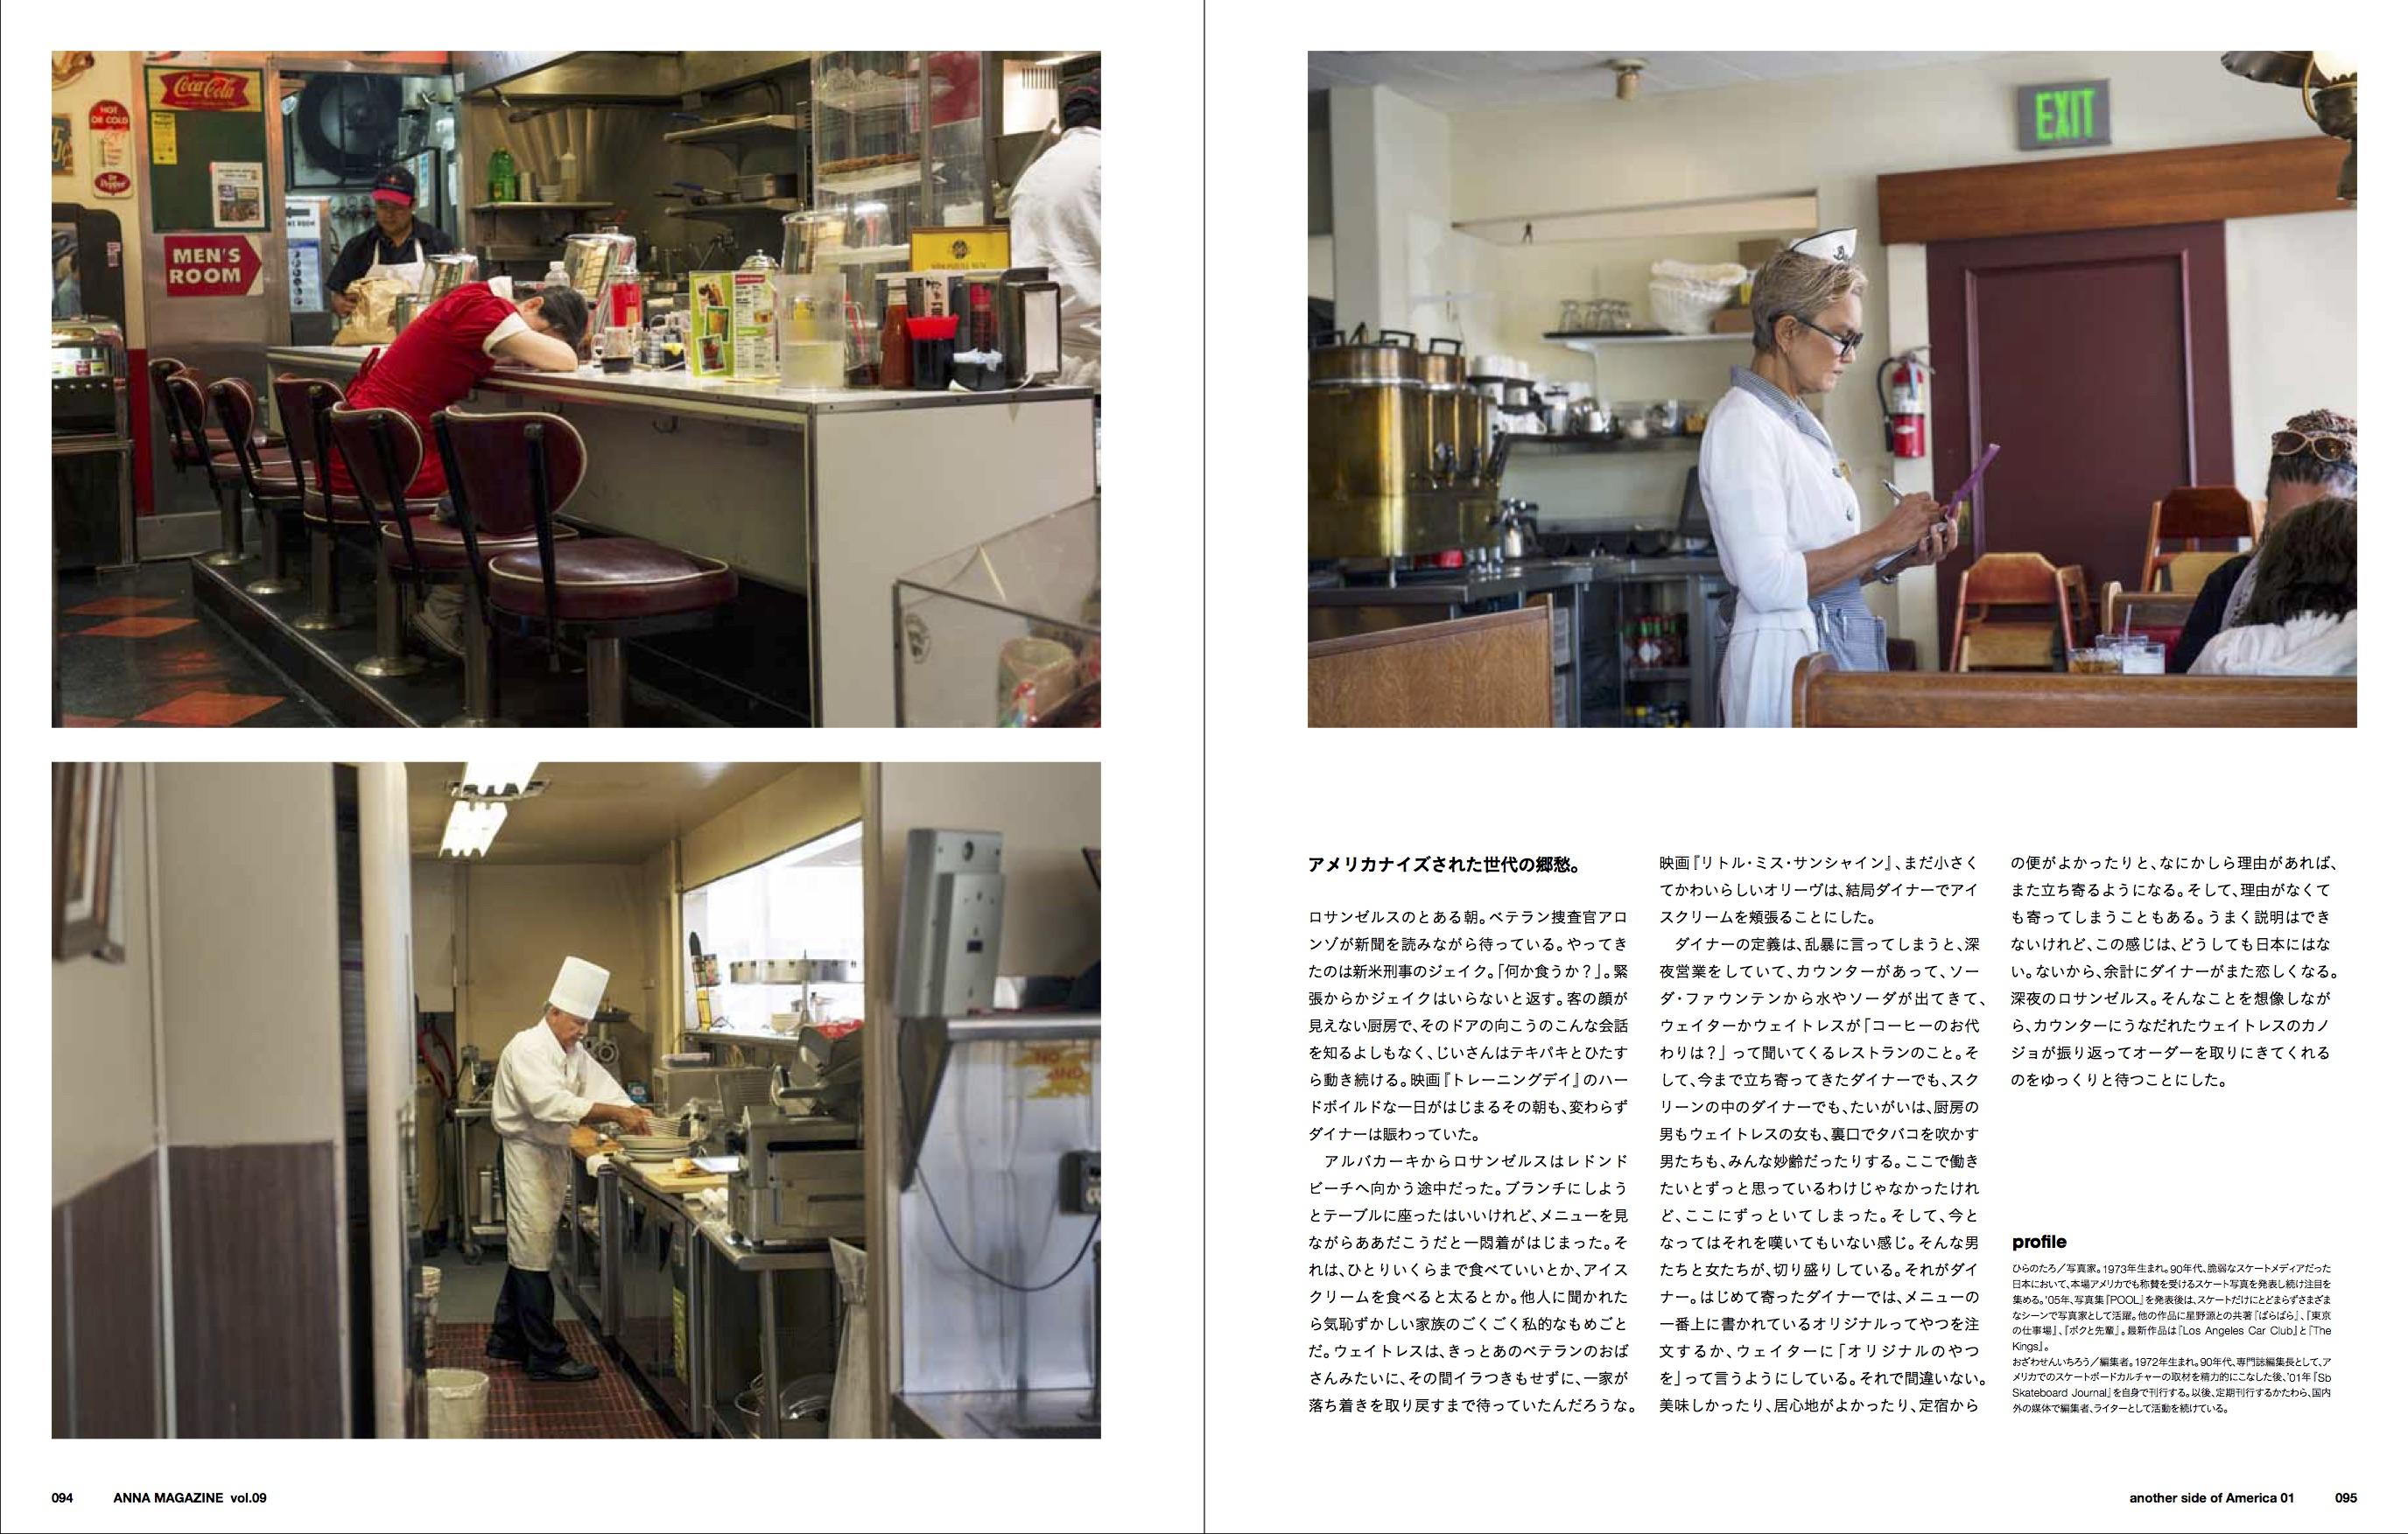 anna magazine vol.9 P46